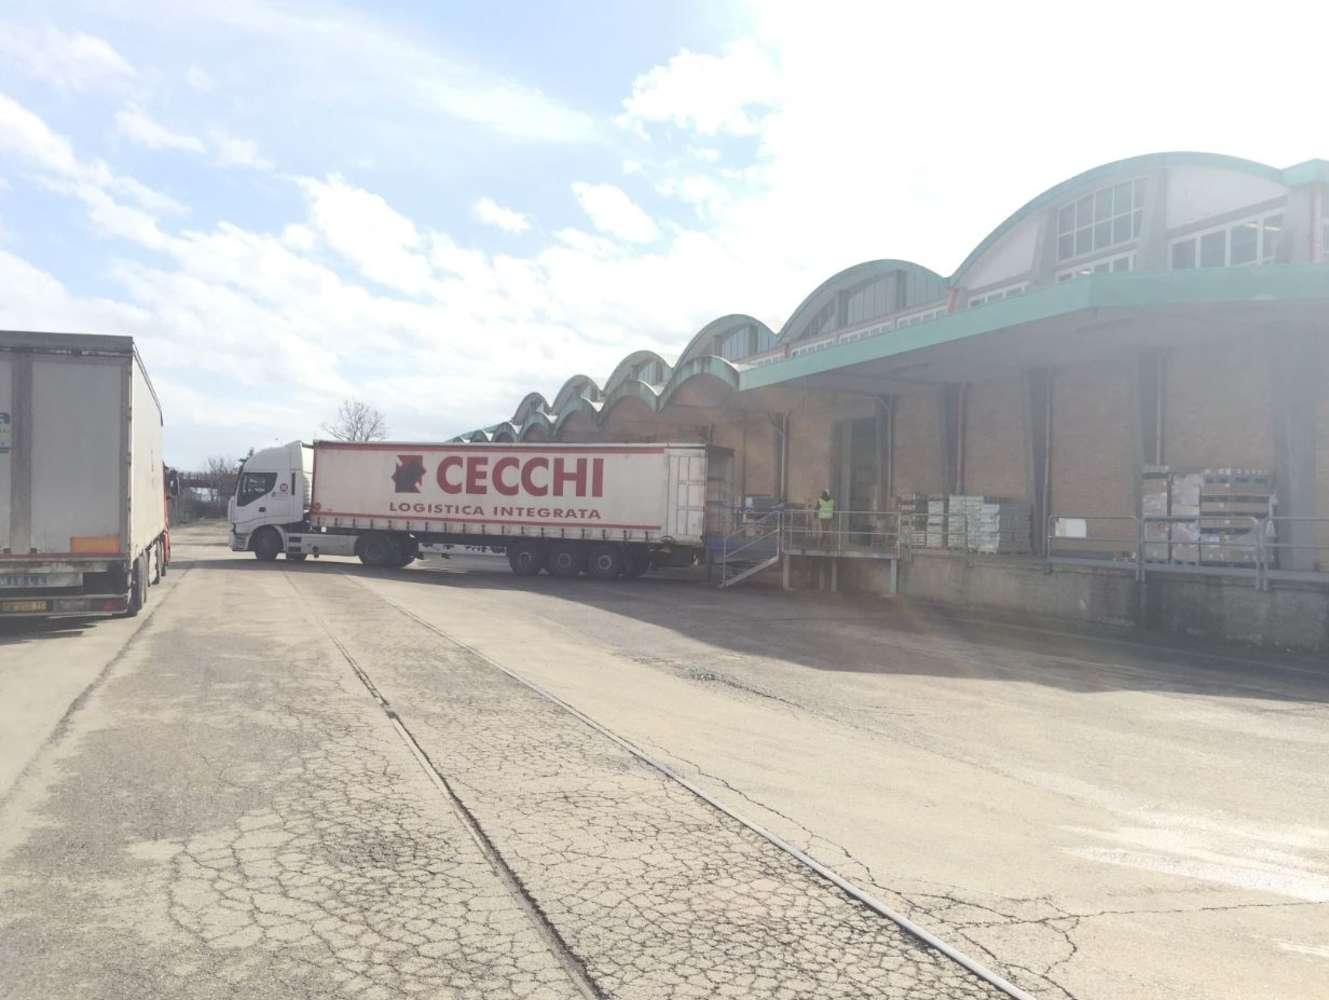 Magazzini industriali e logistici Cesena, 47521 - Cesena Warehouse - 9212973